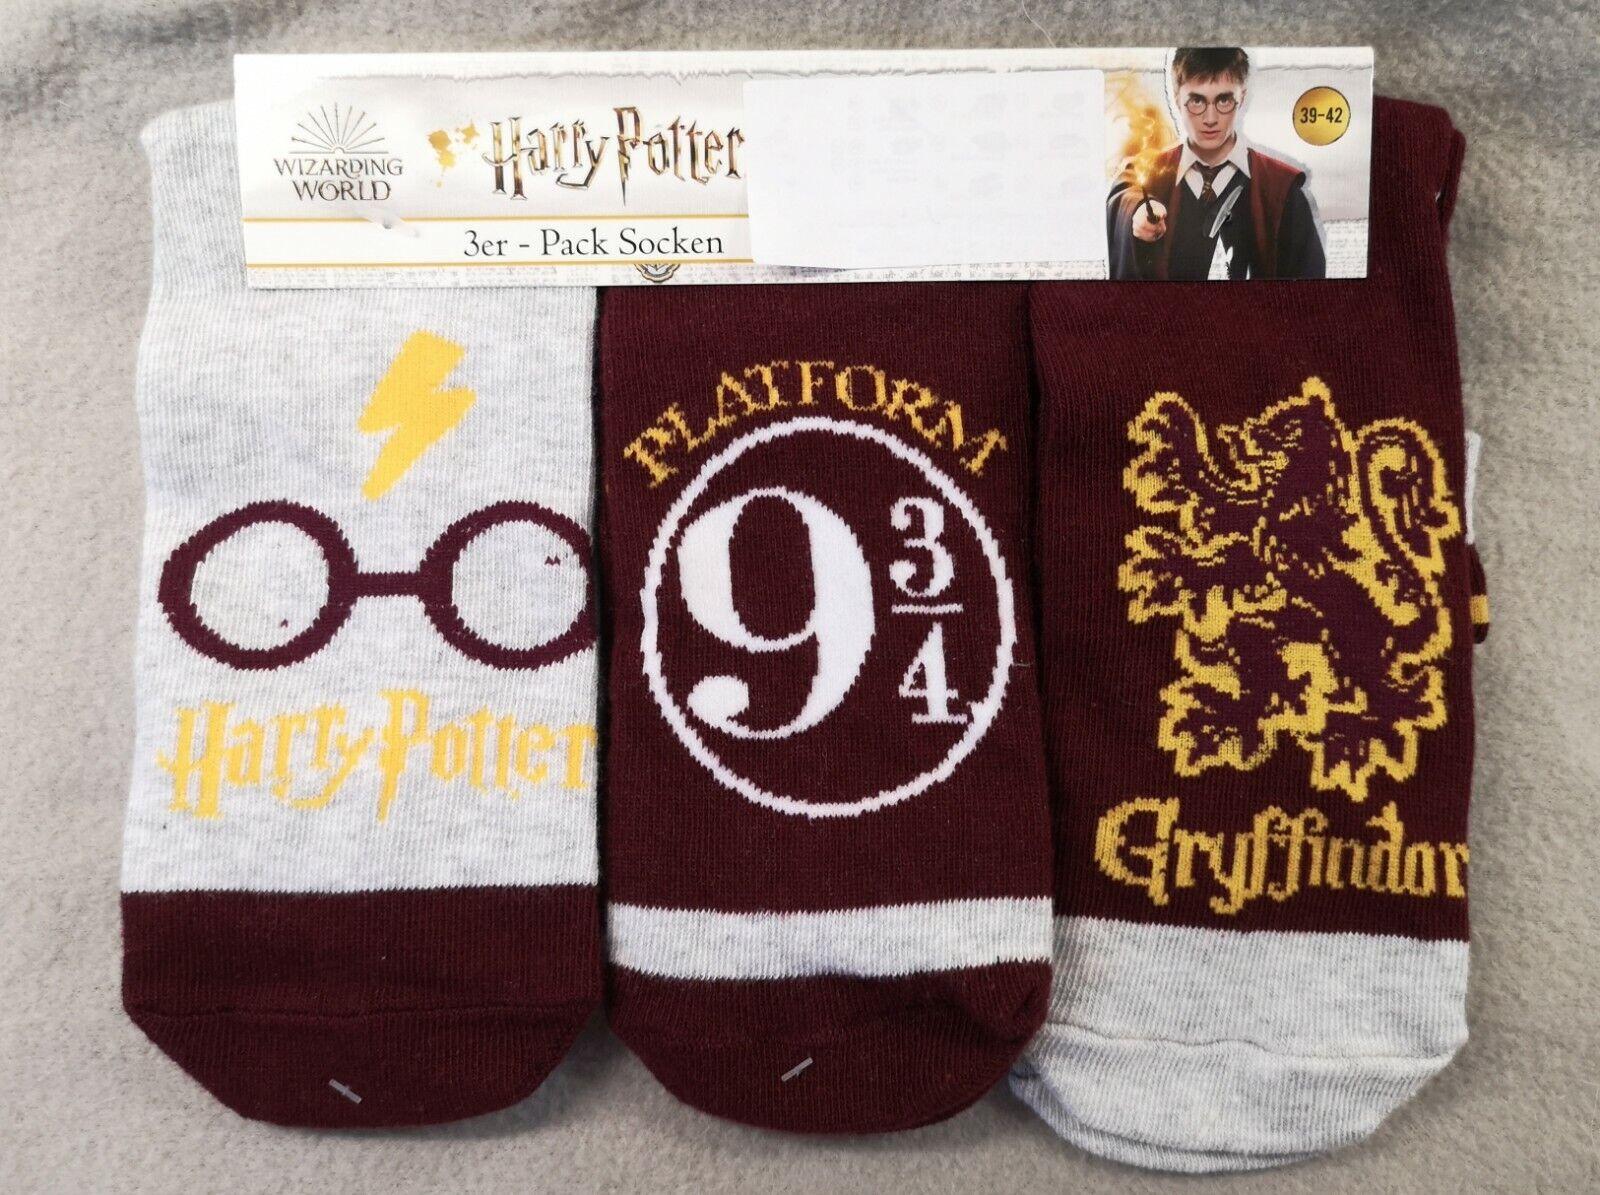 HARRY POTTER 3 Paar Socken Strümpfe 39 - 42 GRYFFINDOR NEU & ETIKETT